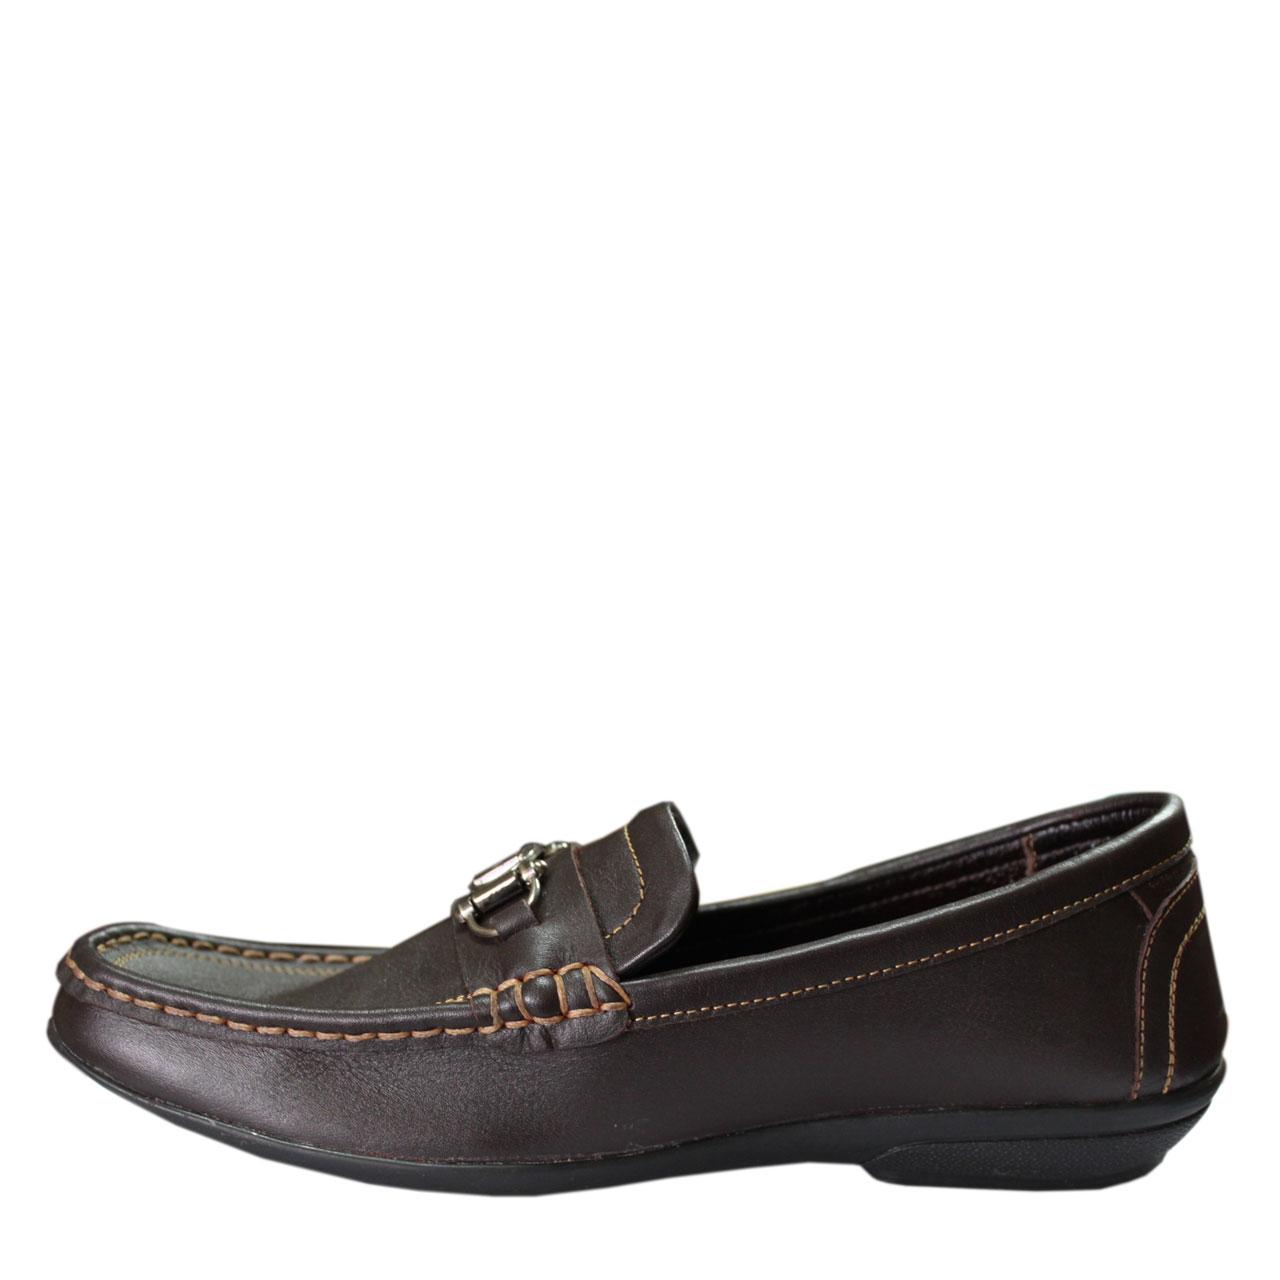 Giày nam da bò B860